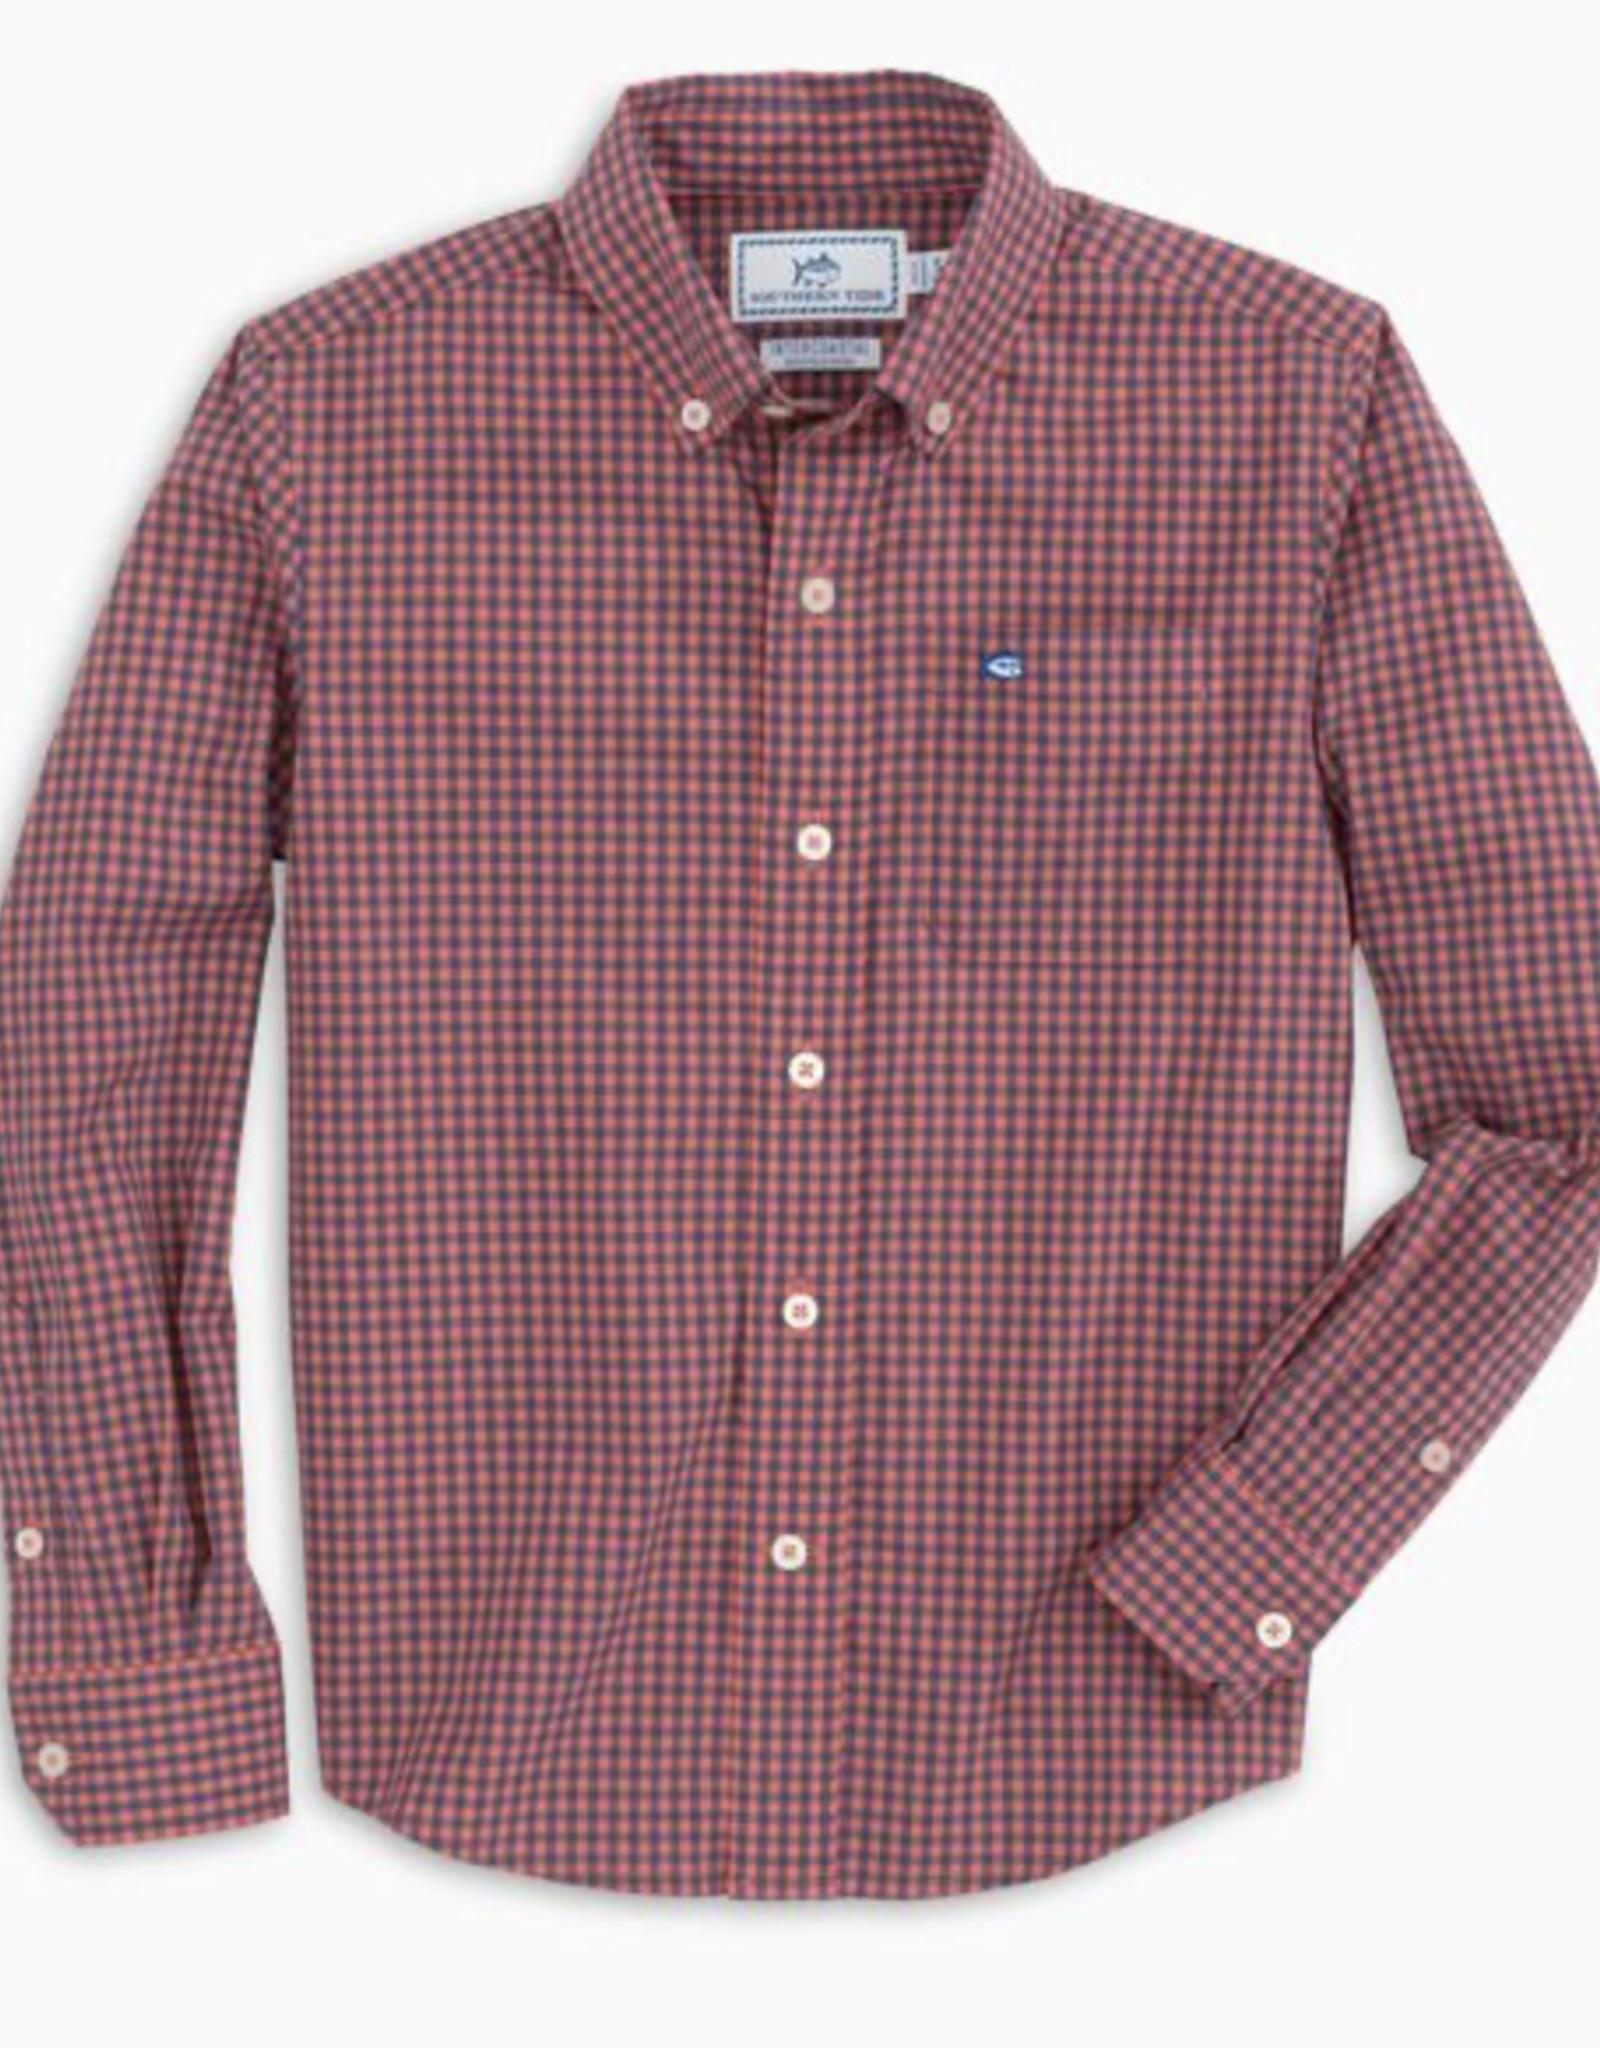 Southern Tide Coral Blush Cotton Stretch Check Sportshirt